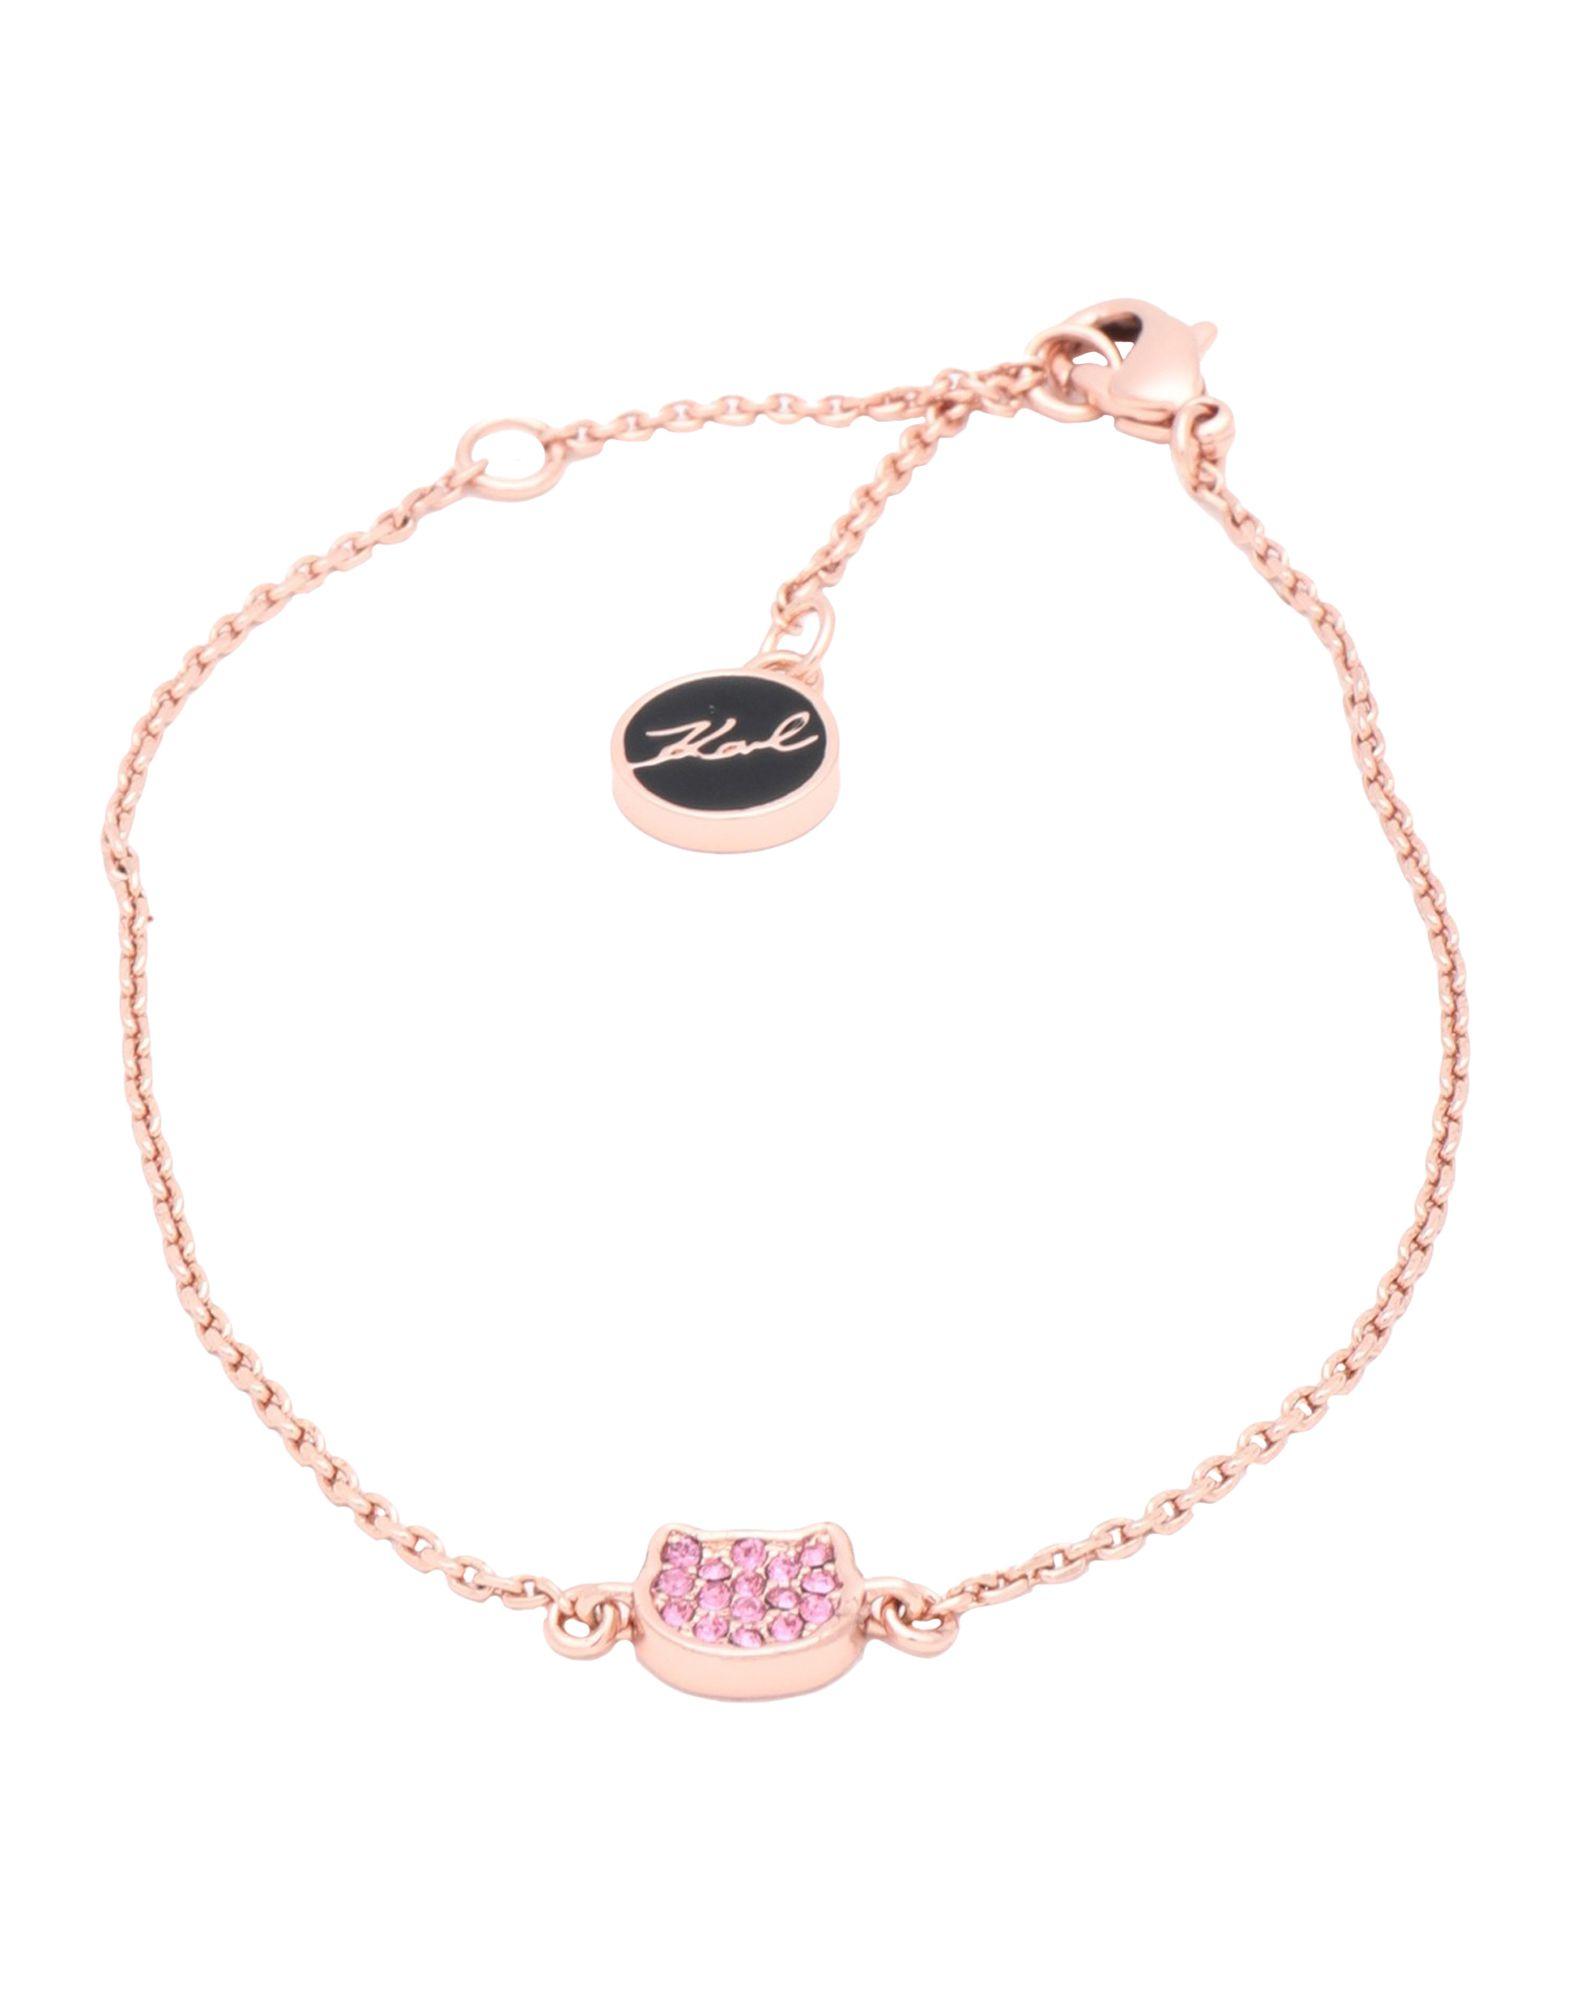 KARL LAGERFELD Bracelets - Item 50243661